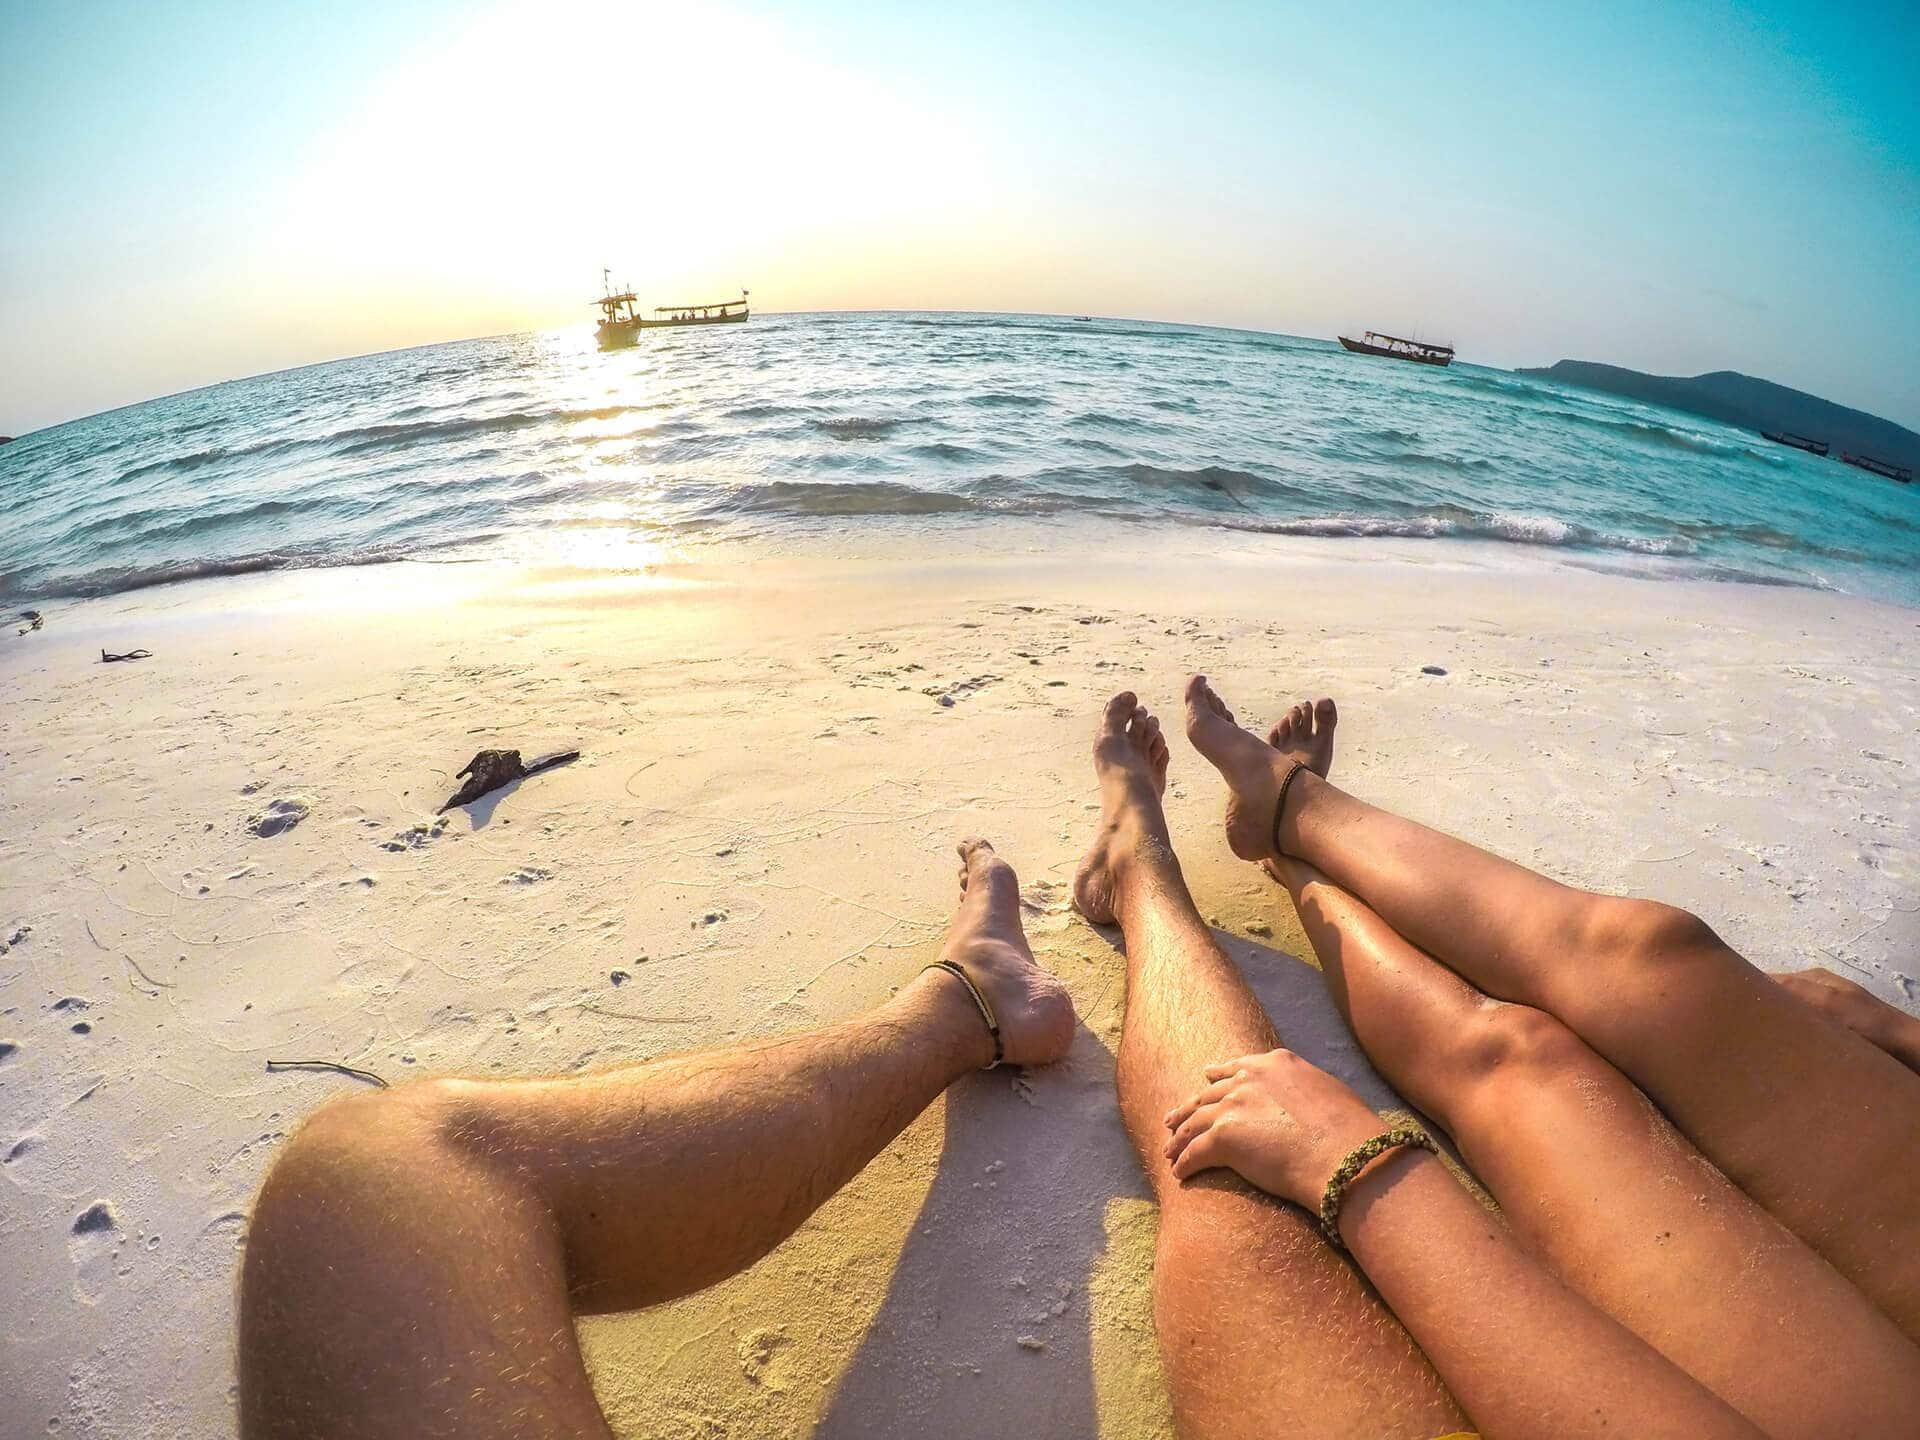 cambodia island koh rong sunset beach